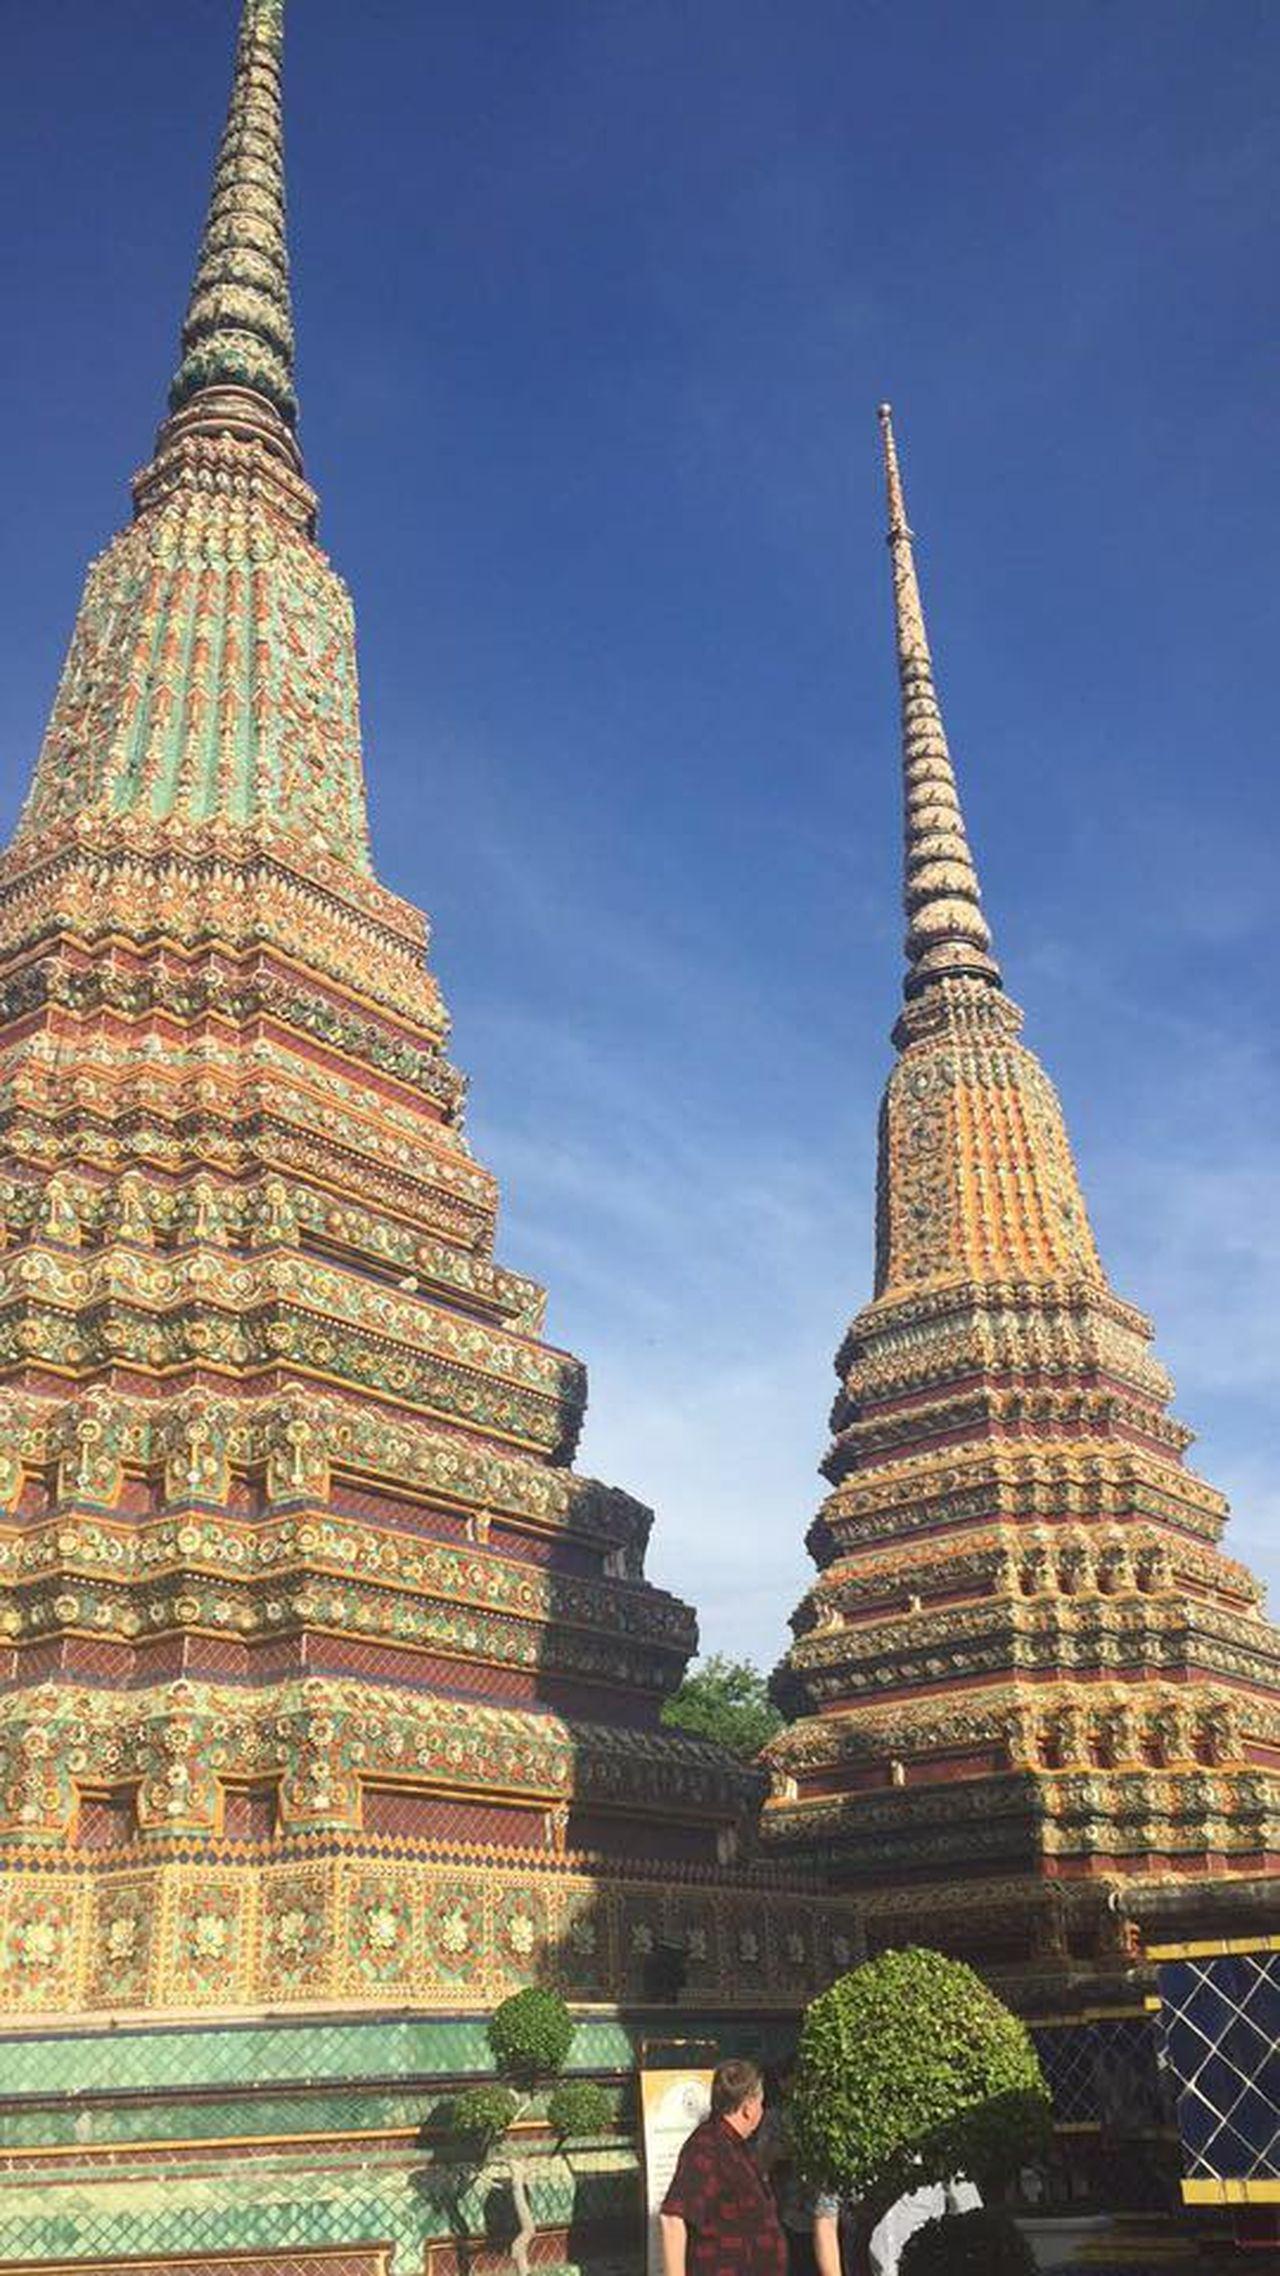 Thailand Bangkok Beach Buddha Chiangmai Chiangrai Elephant Longboat Nature Phangan Phiphi Phuket Sunset Temple Thailand Travel